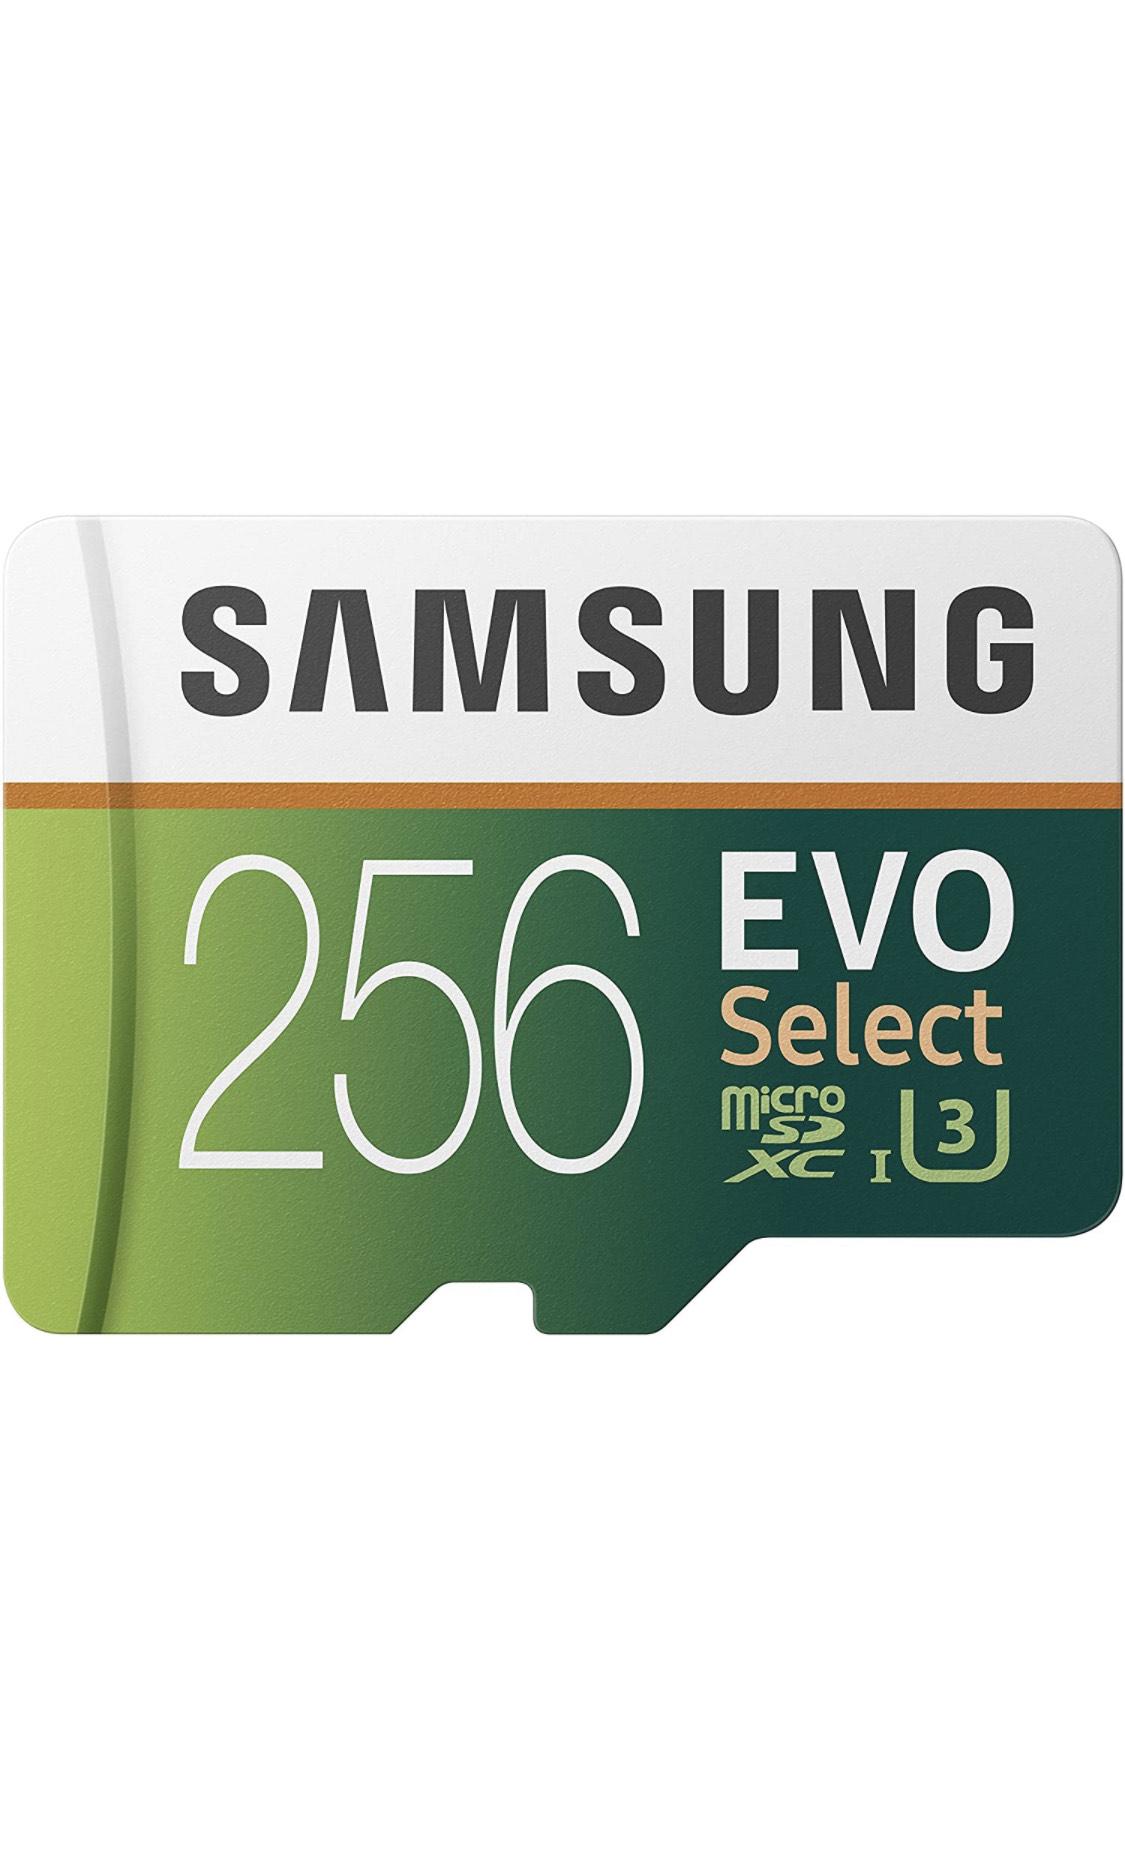 [Prime] Samsung 256 GO Carte microSDXC Samsung Evo Select UHS-I U3 (MB-ME256HA/EU) - 256 Go